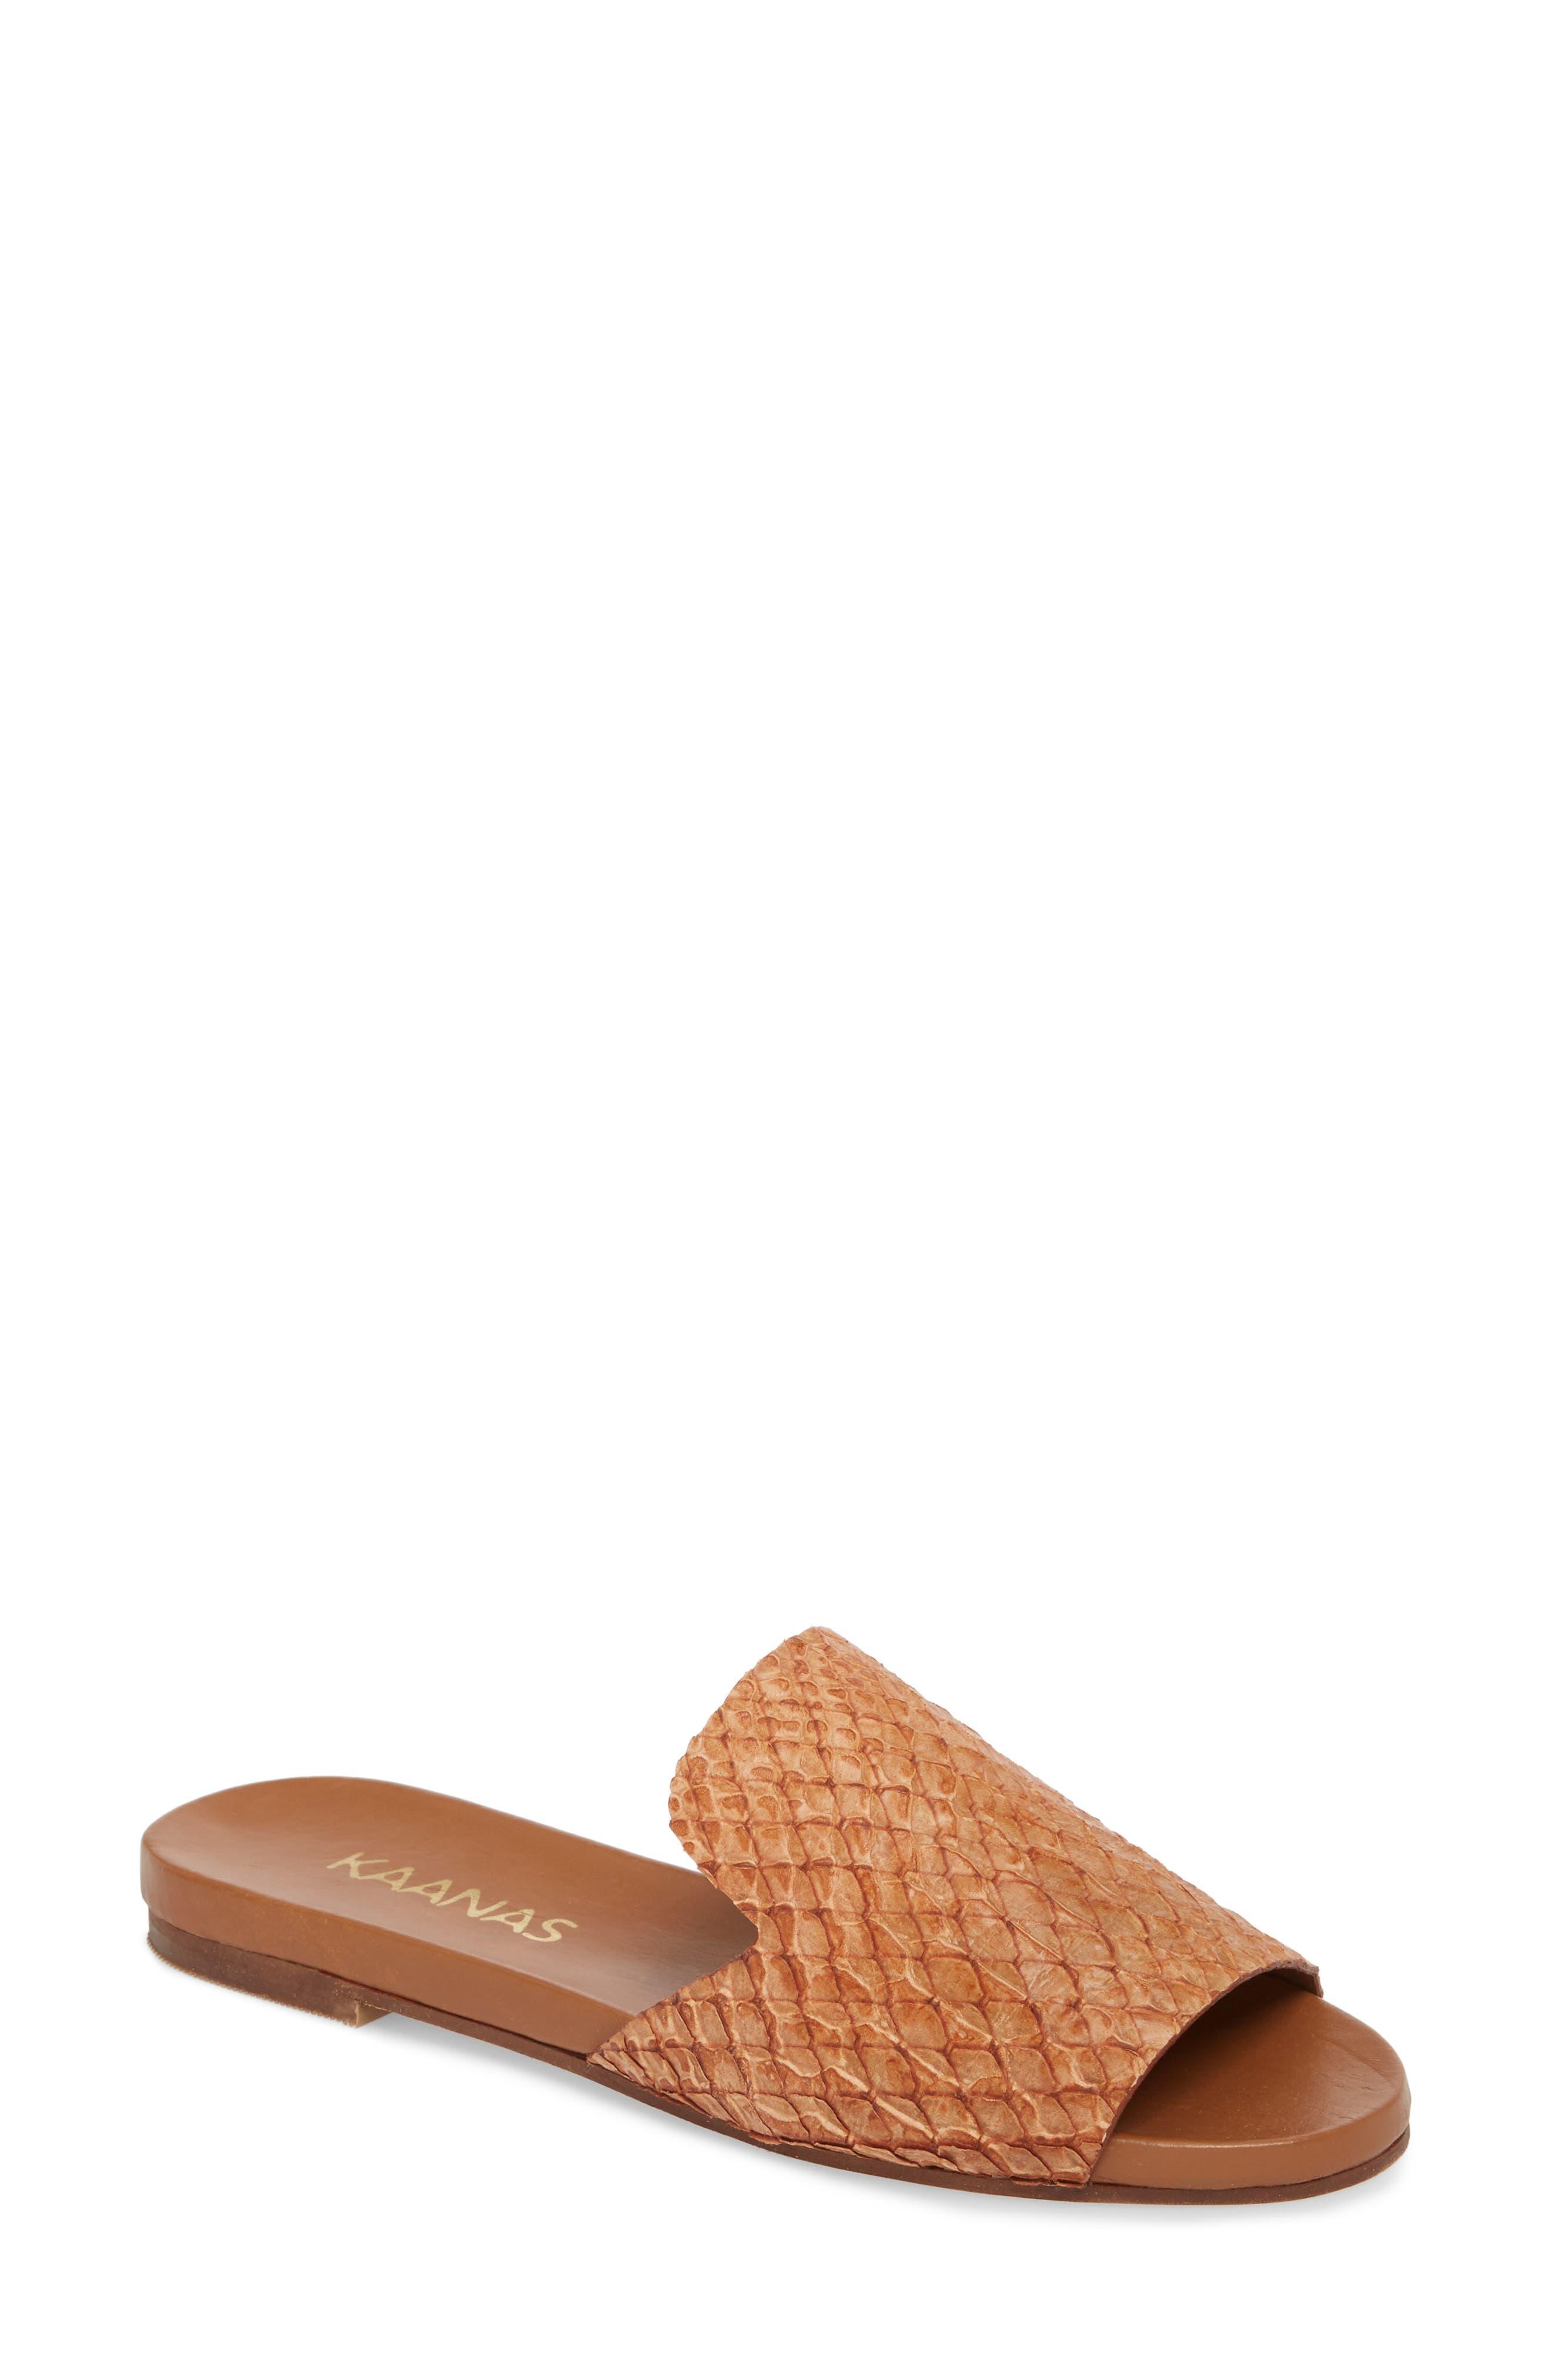 Leticia Loafer Mule Sandal,                         Main,                         color, Honey